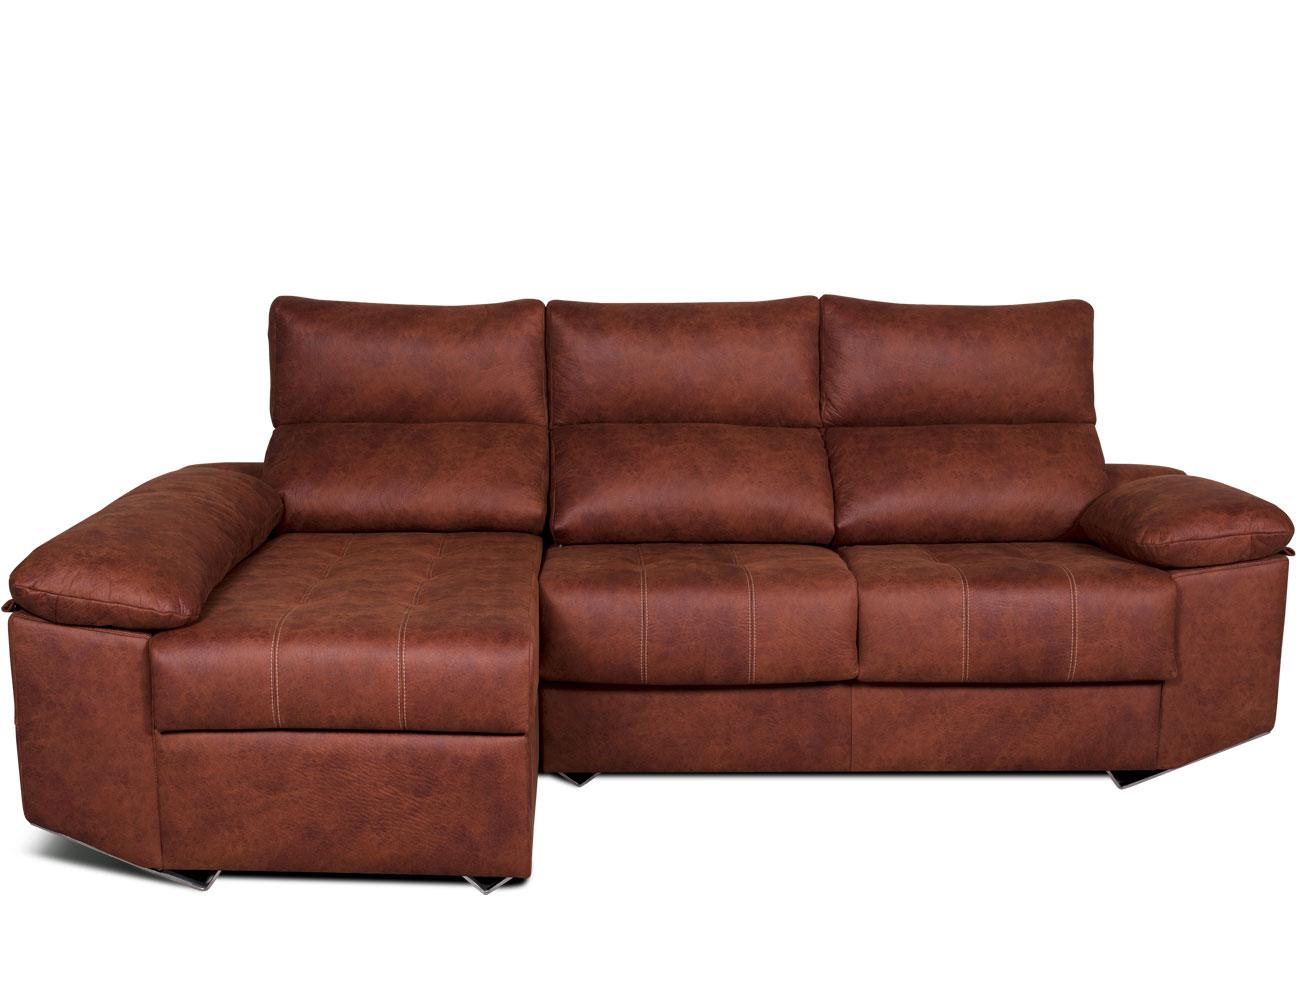 Sofa chaiselongue moderno patas forma tejido anti manchas 26